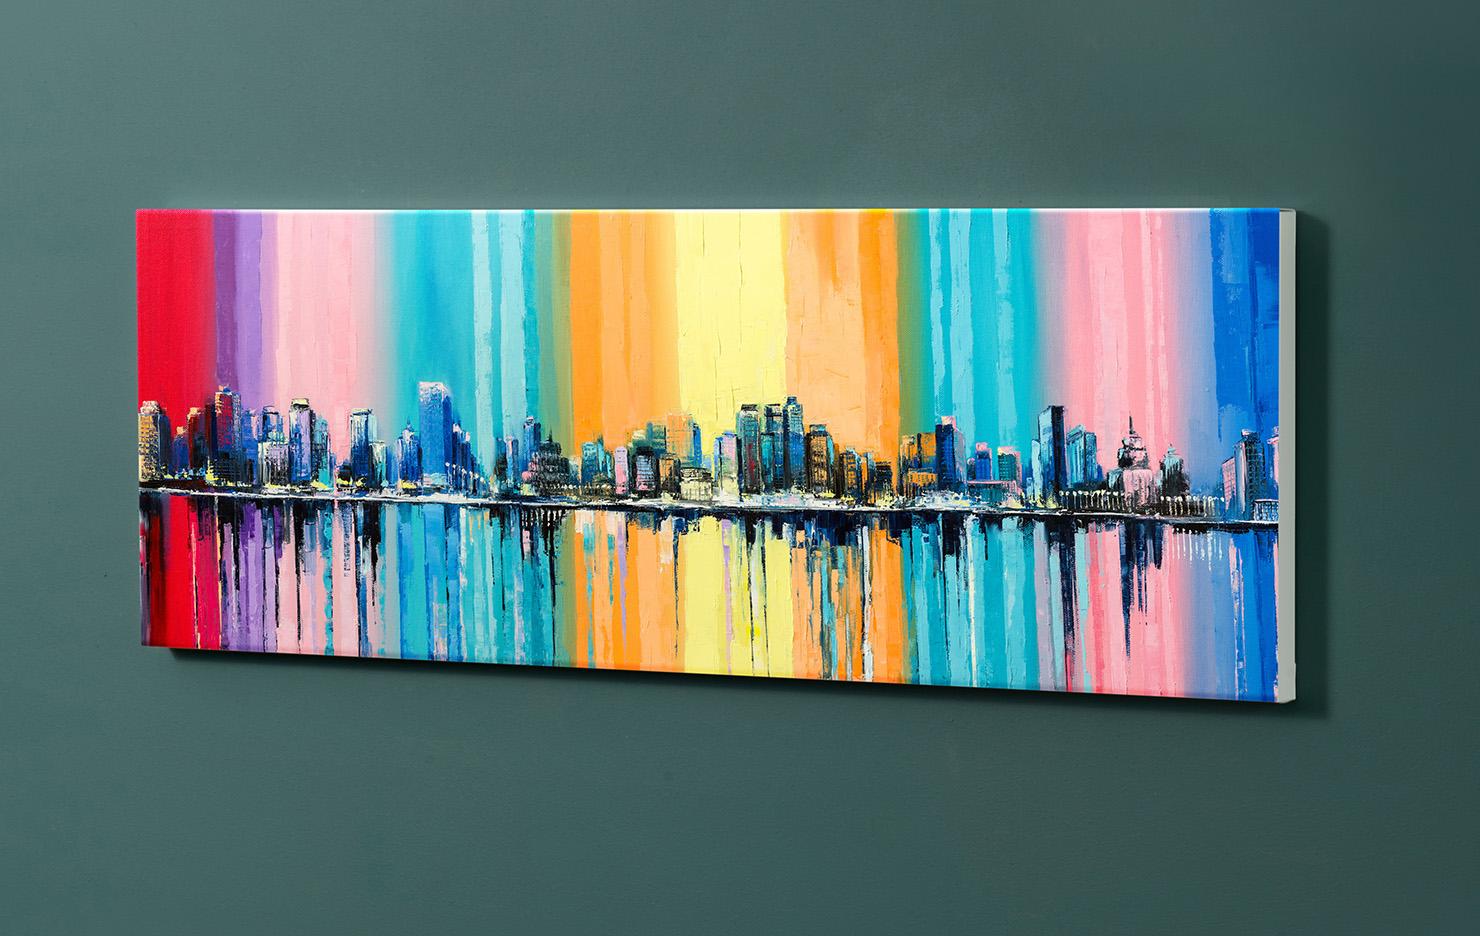 Magnettafel NOTIZ 90x30cm Motiv-Pinnwand M132 Kunst Gemälde